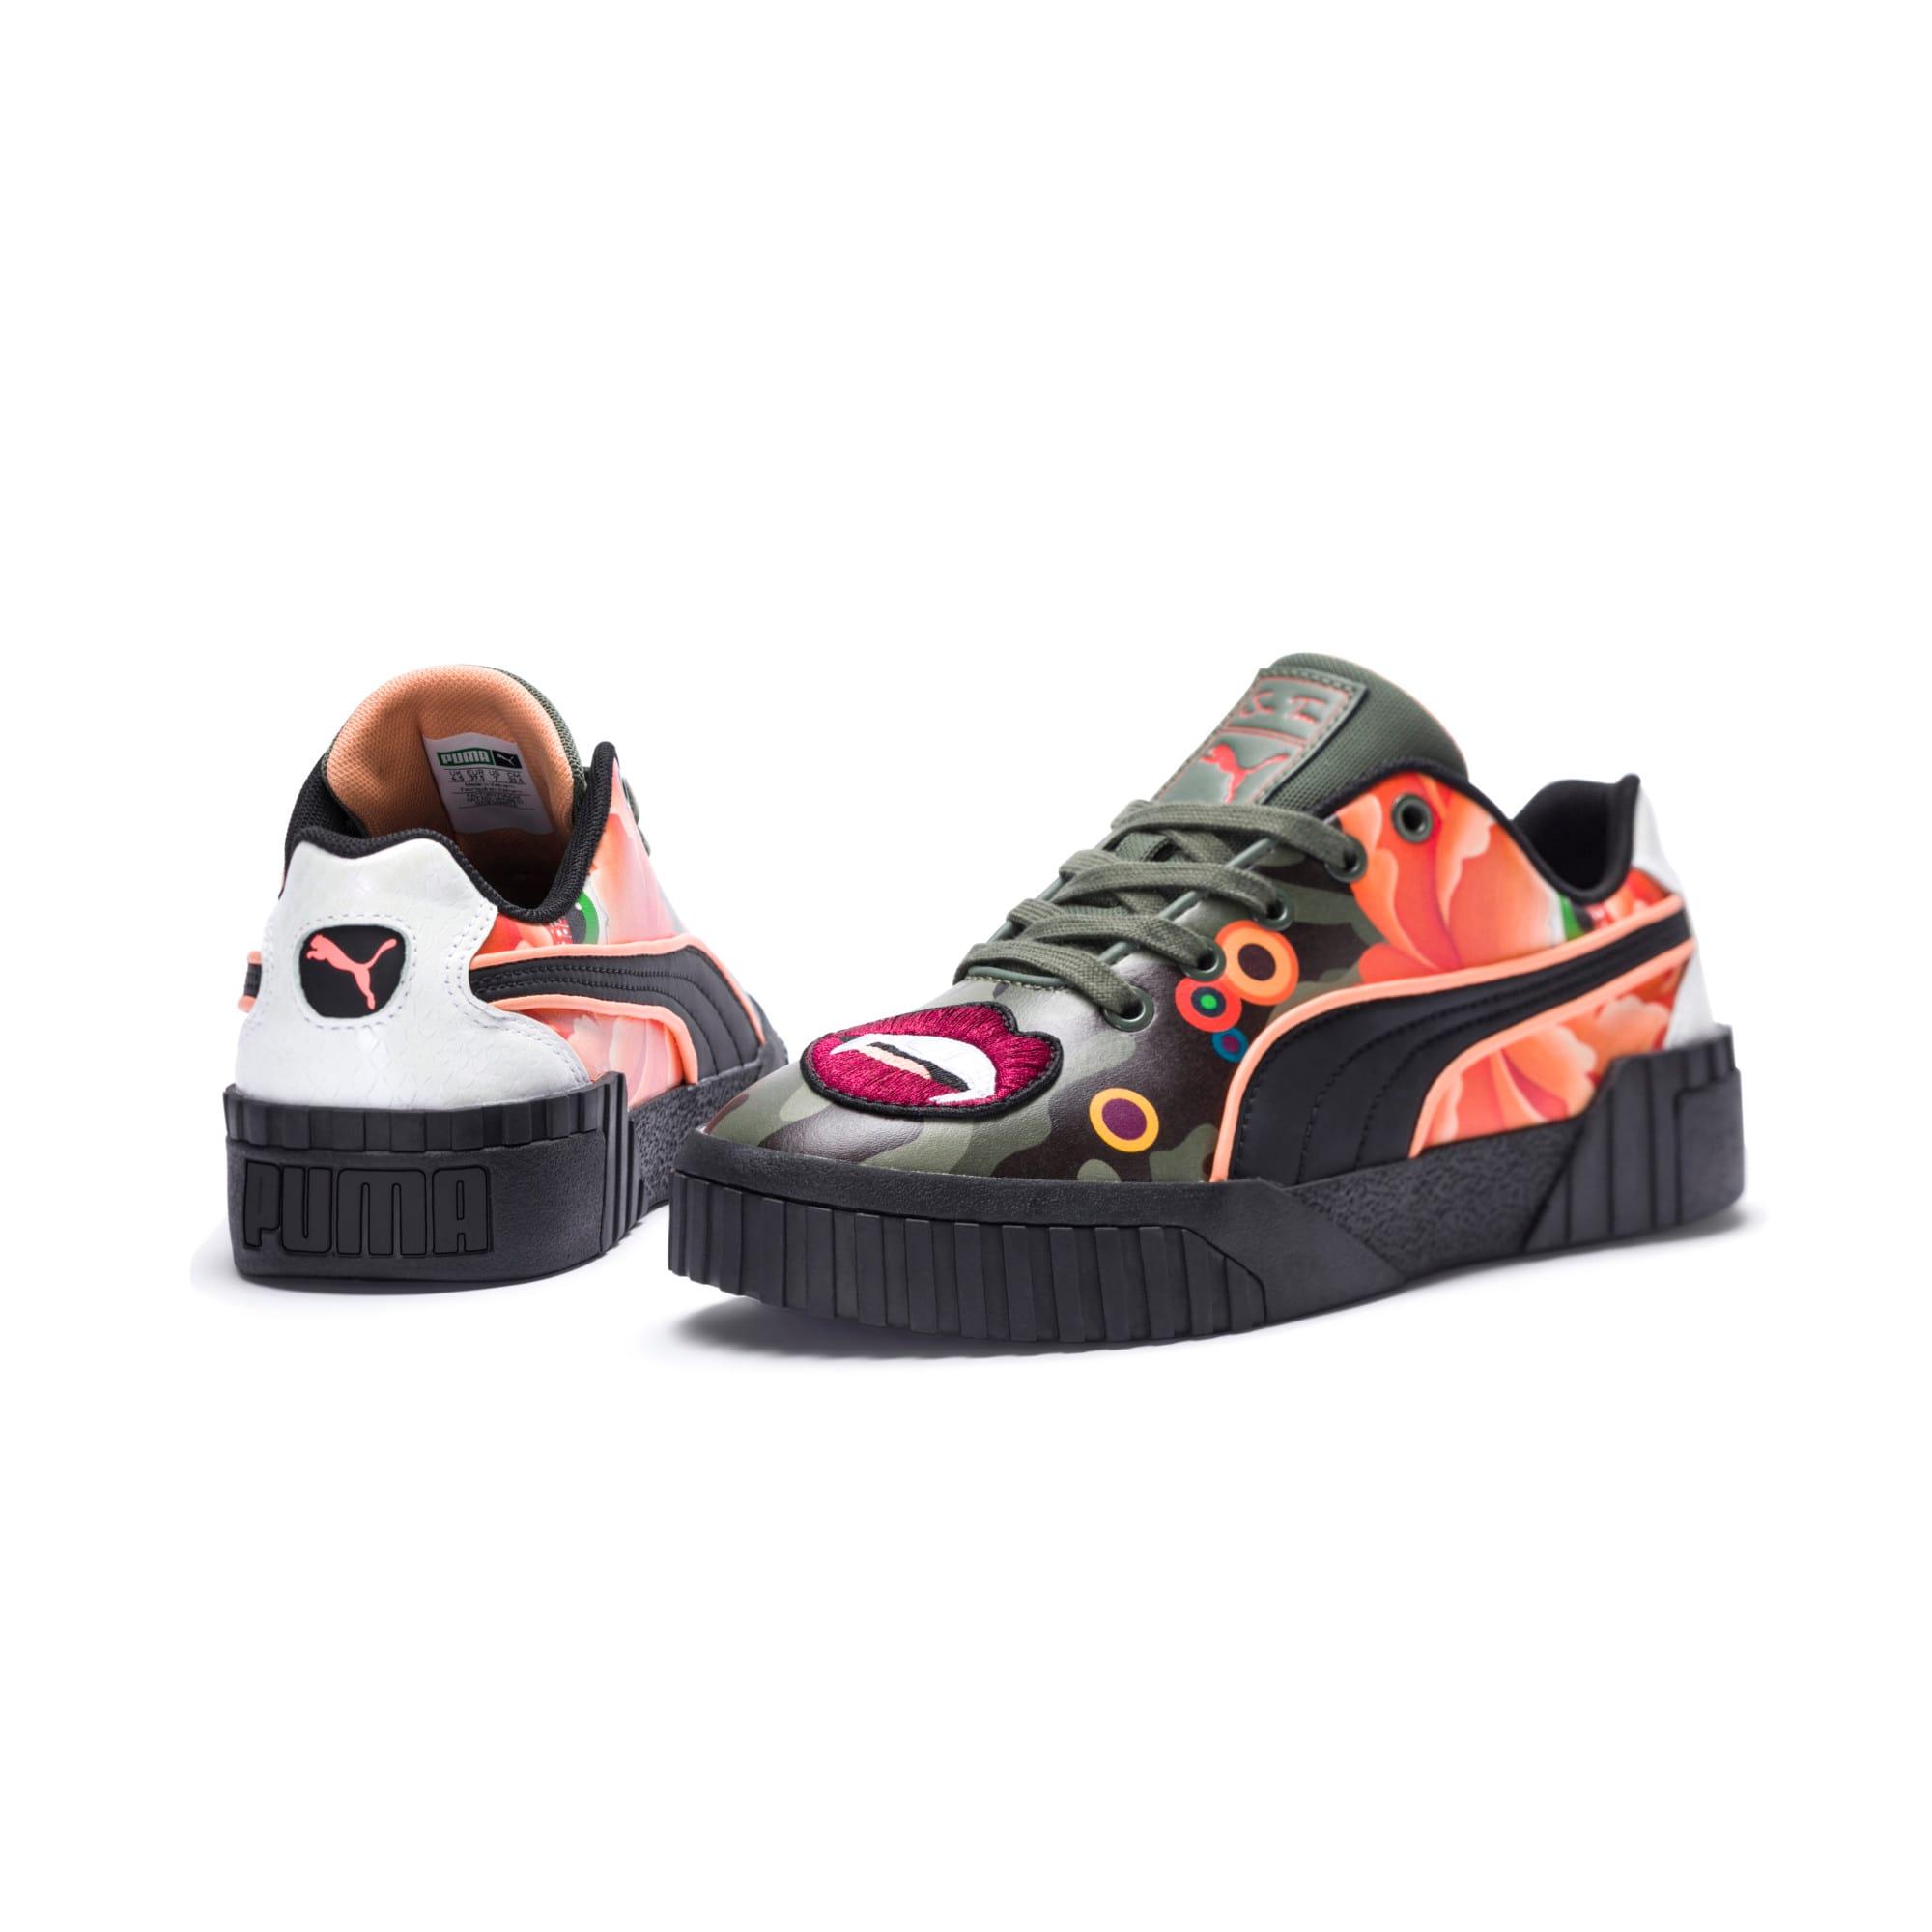 Thumbnail 9 of PUMA x SUE TSAI Cali 'Peonies Camo' Women's Sneakers, Puma Black-Puma Black, medium